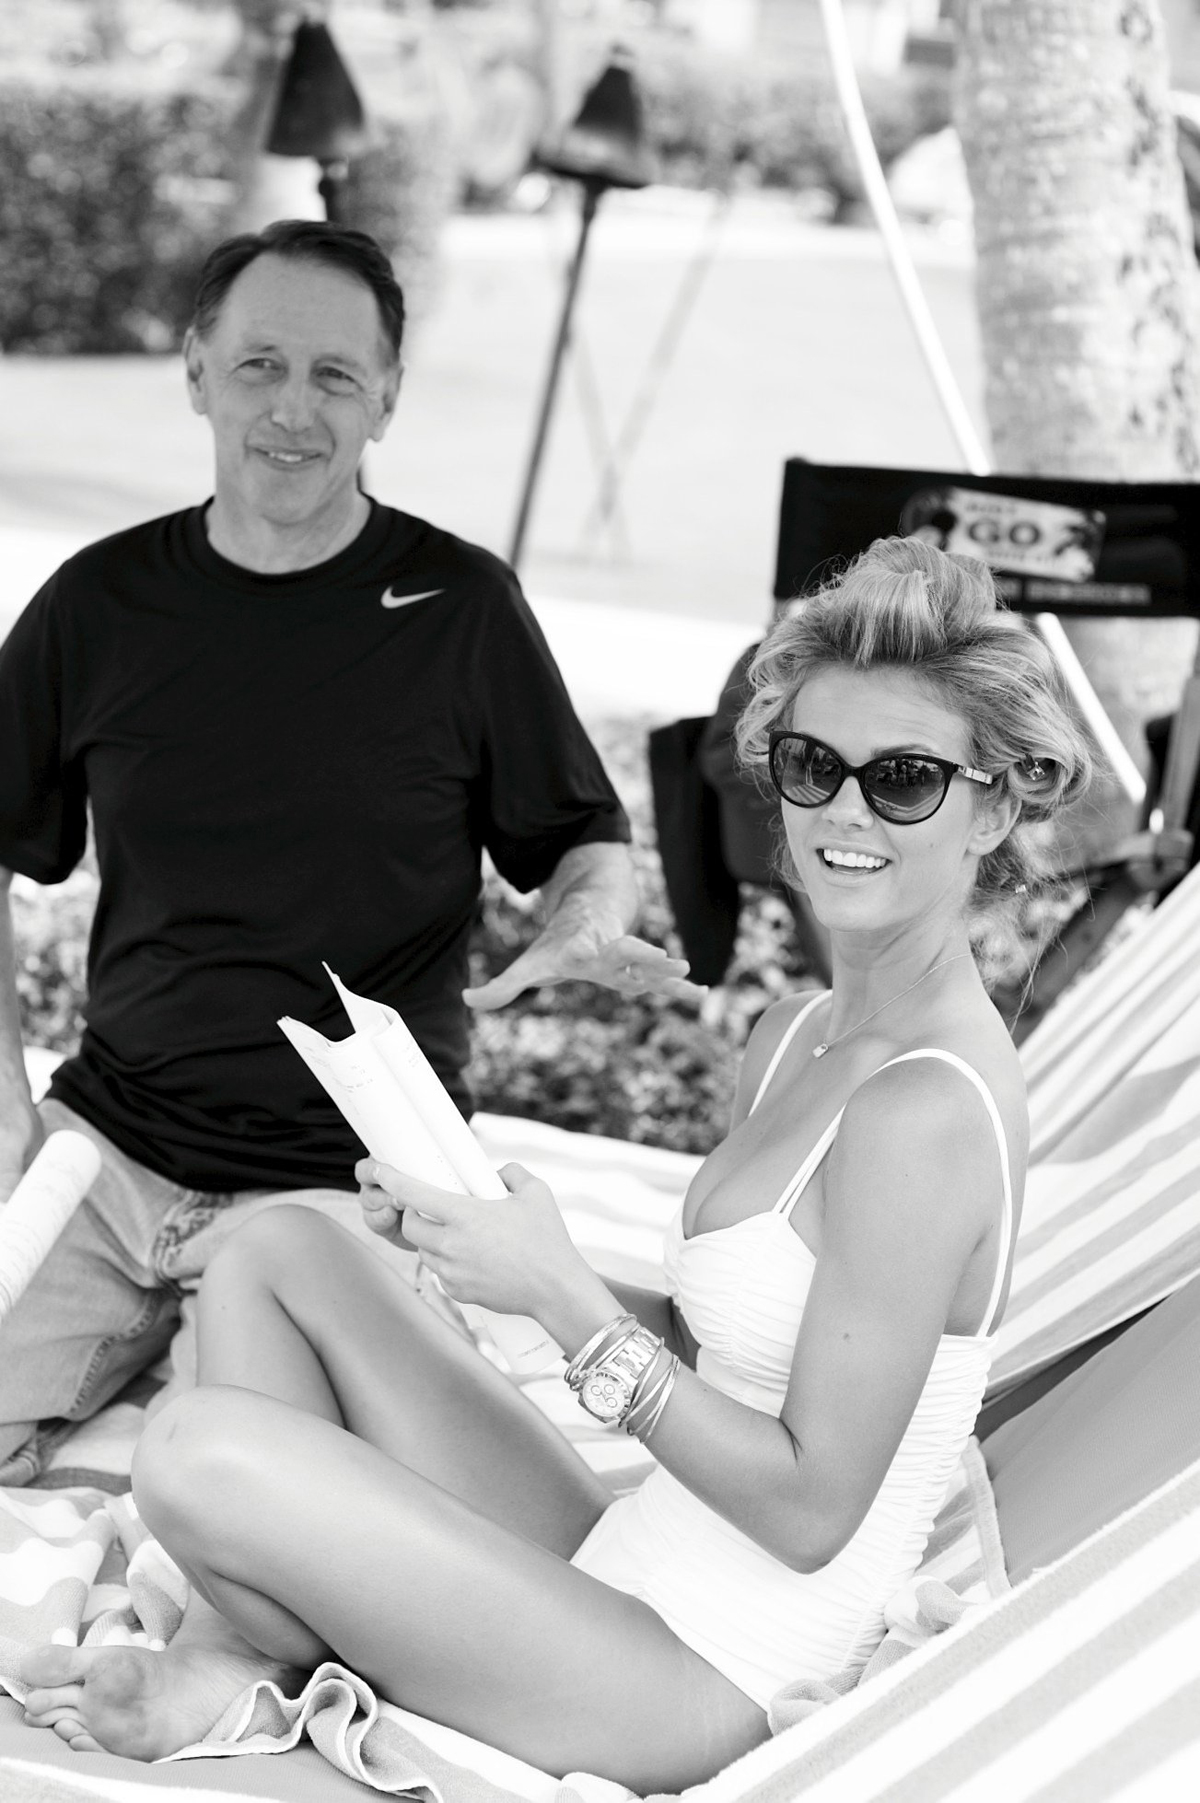 Brooklyn Decker with director Dennis Dugan, SI Swimsuit 2011